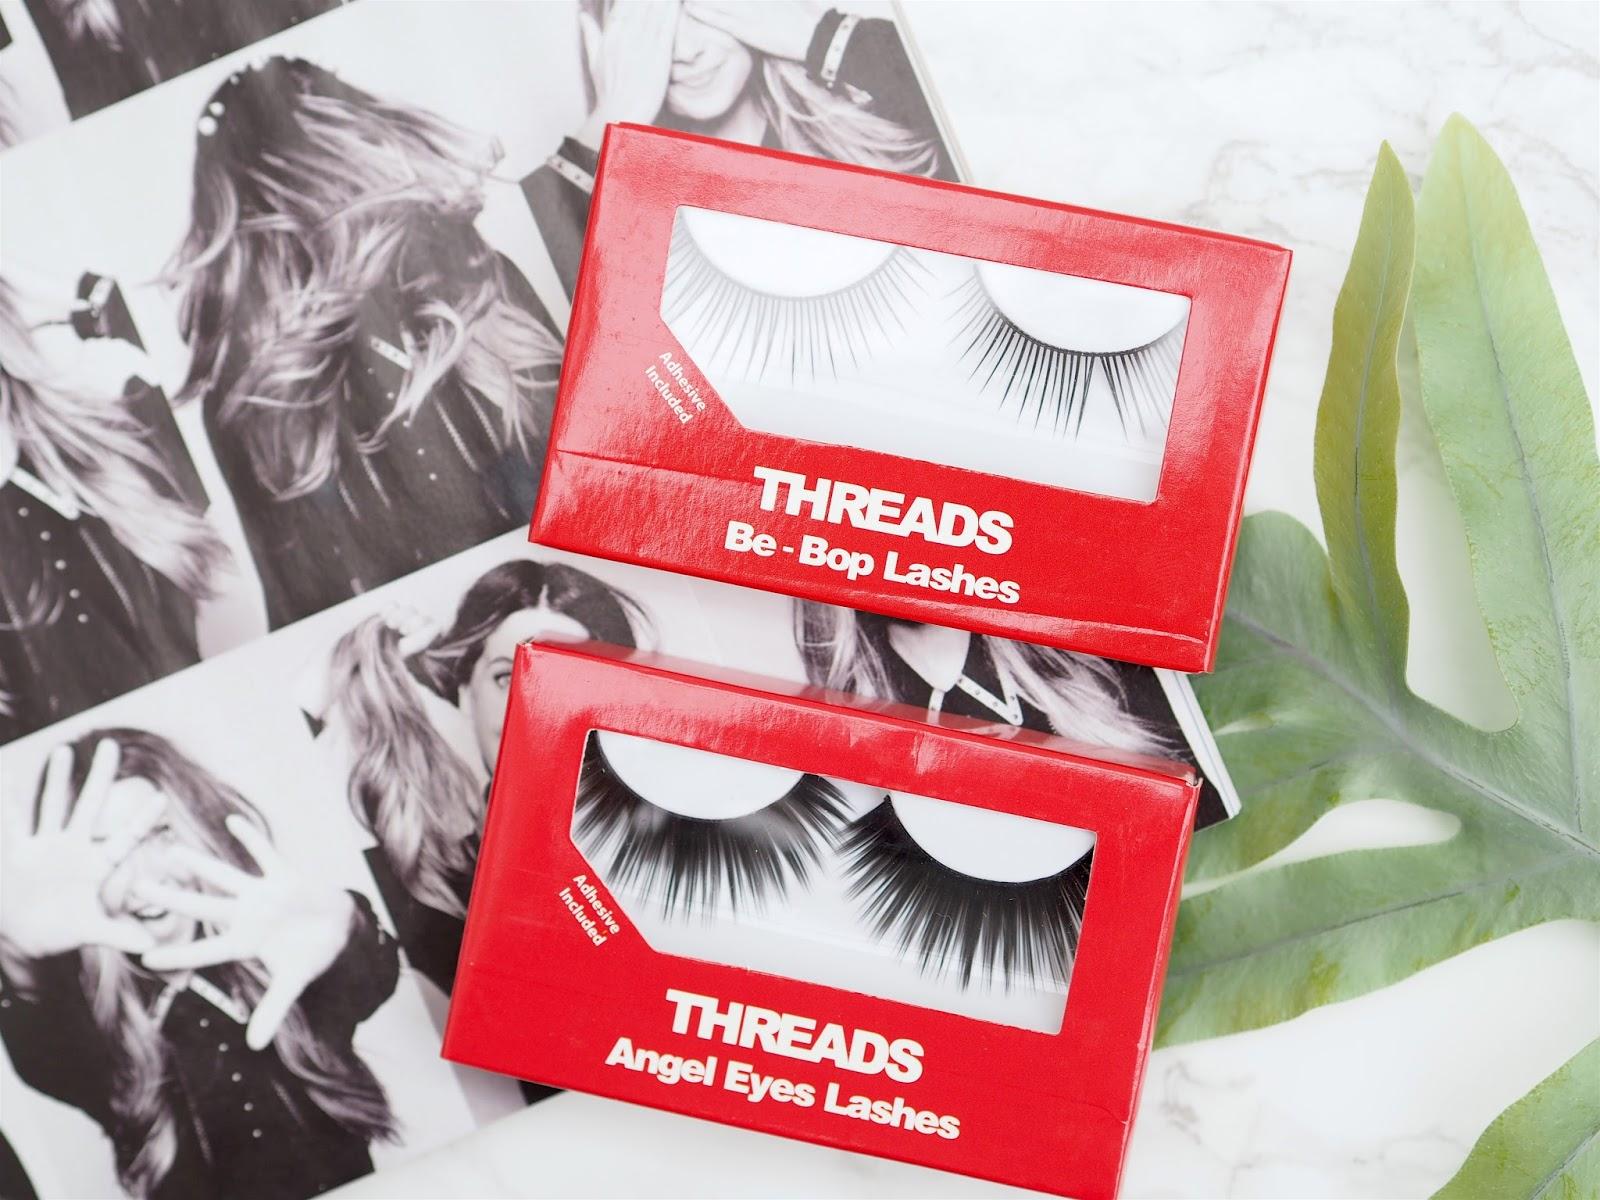 Threads Beauty Angel Eye and Be-Bop False Lashes